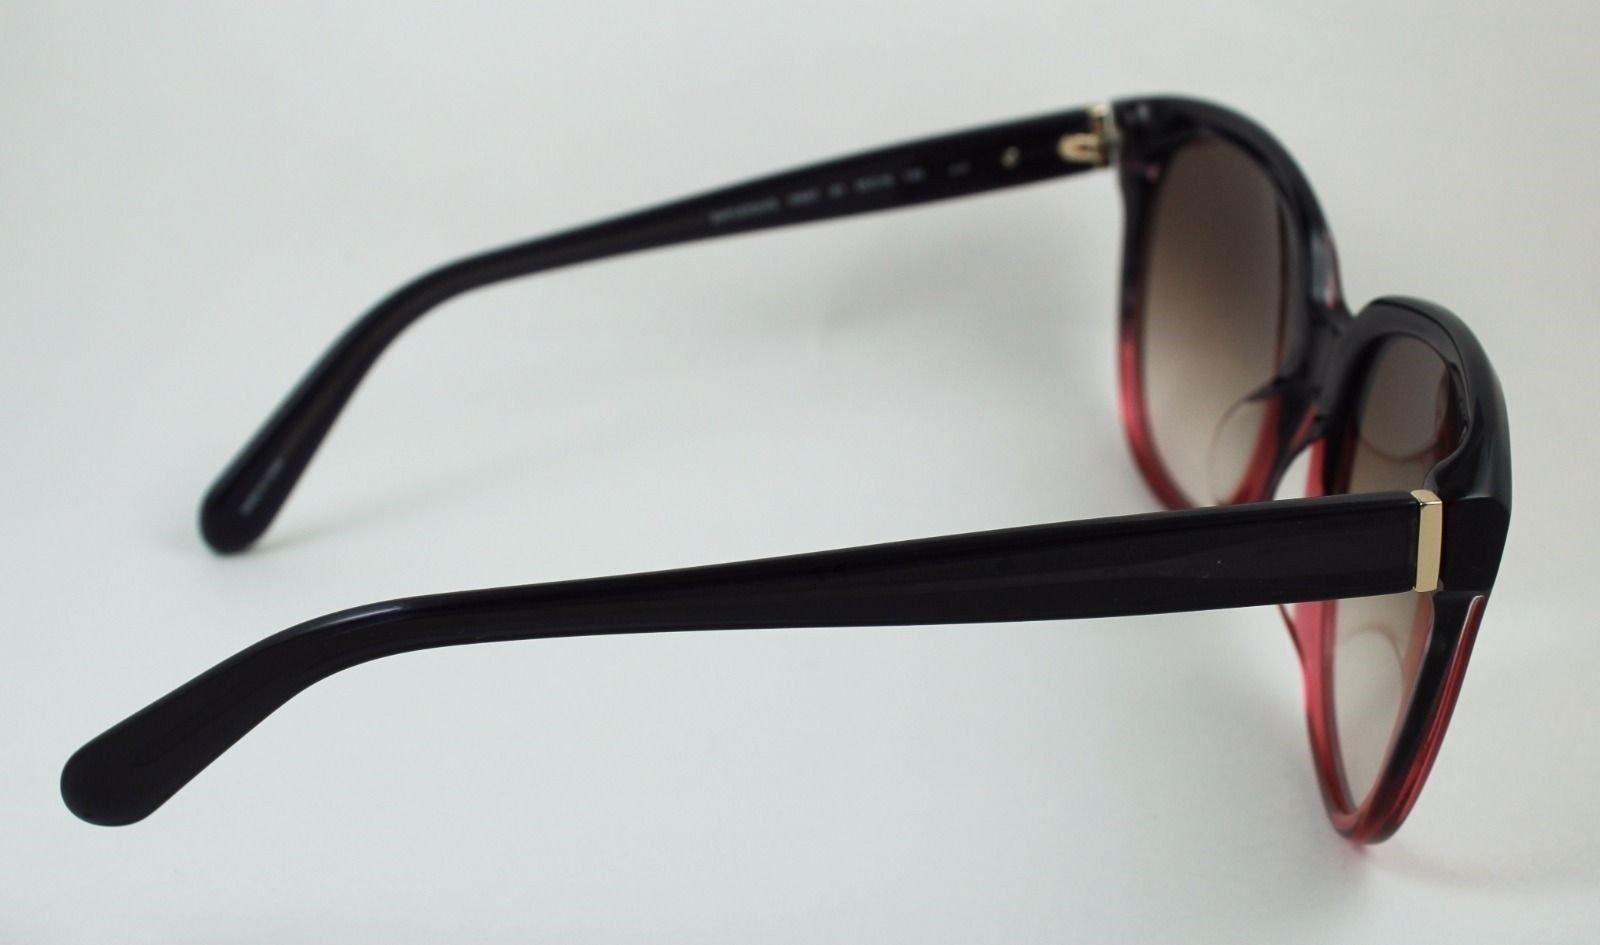 6e11ebf0593ec Kate Spade Bayleigh S Sunglasses Rose to Black Tortoise Fade Brown Gradient  55mm